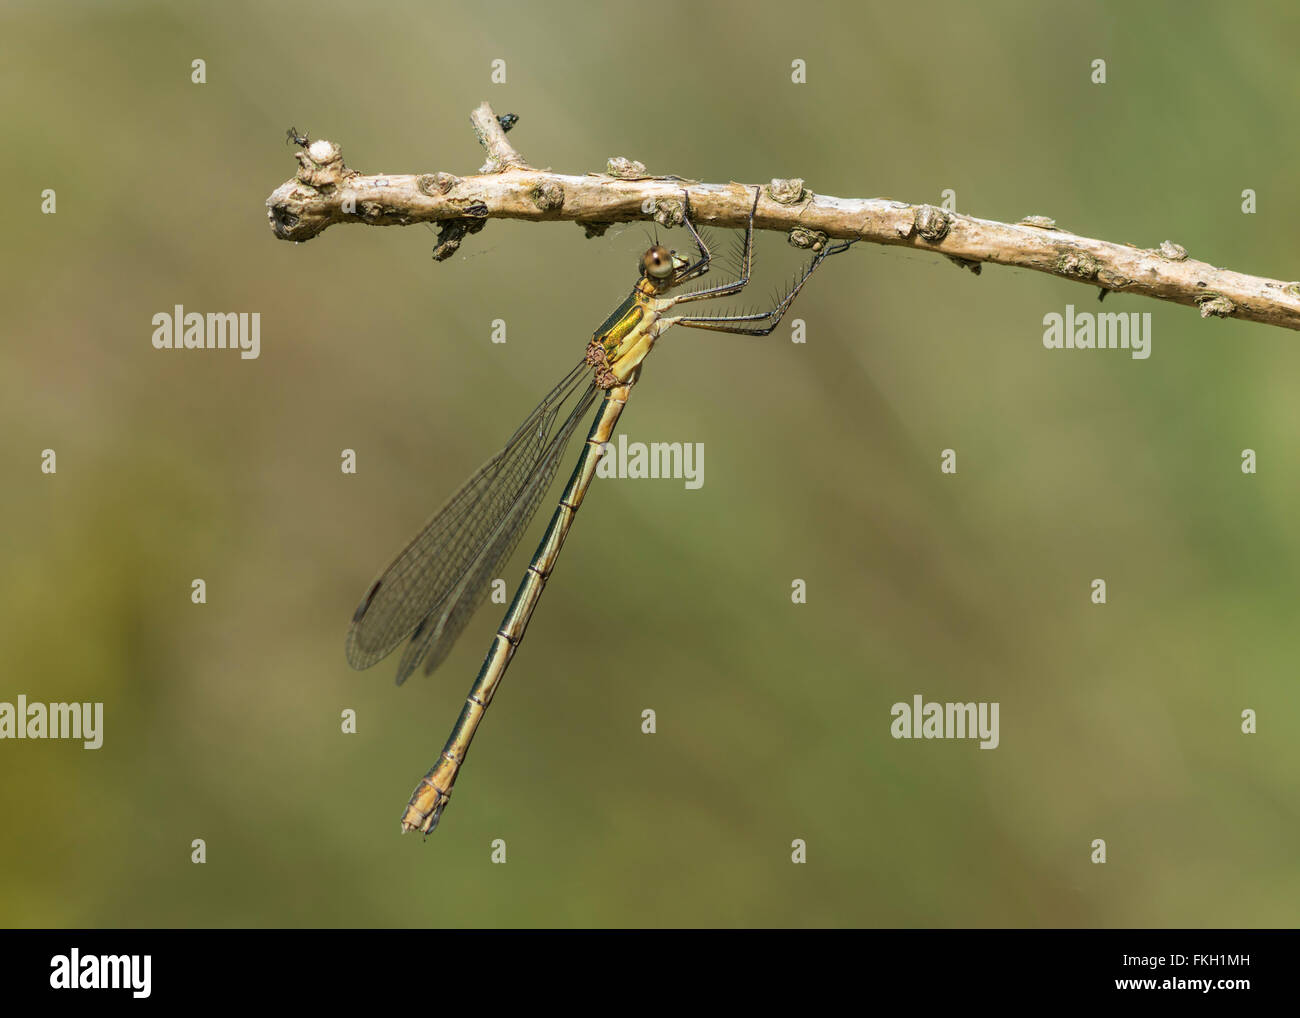 Emerald Damselfly Lestes sponsa under a twig - Stock Image